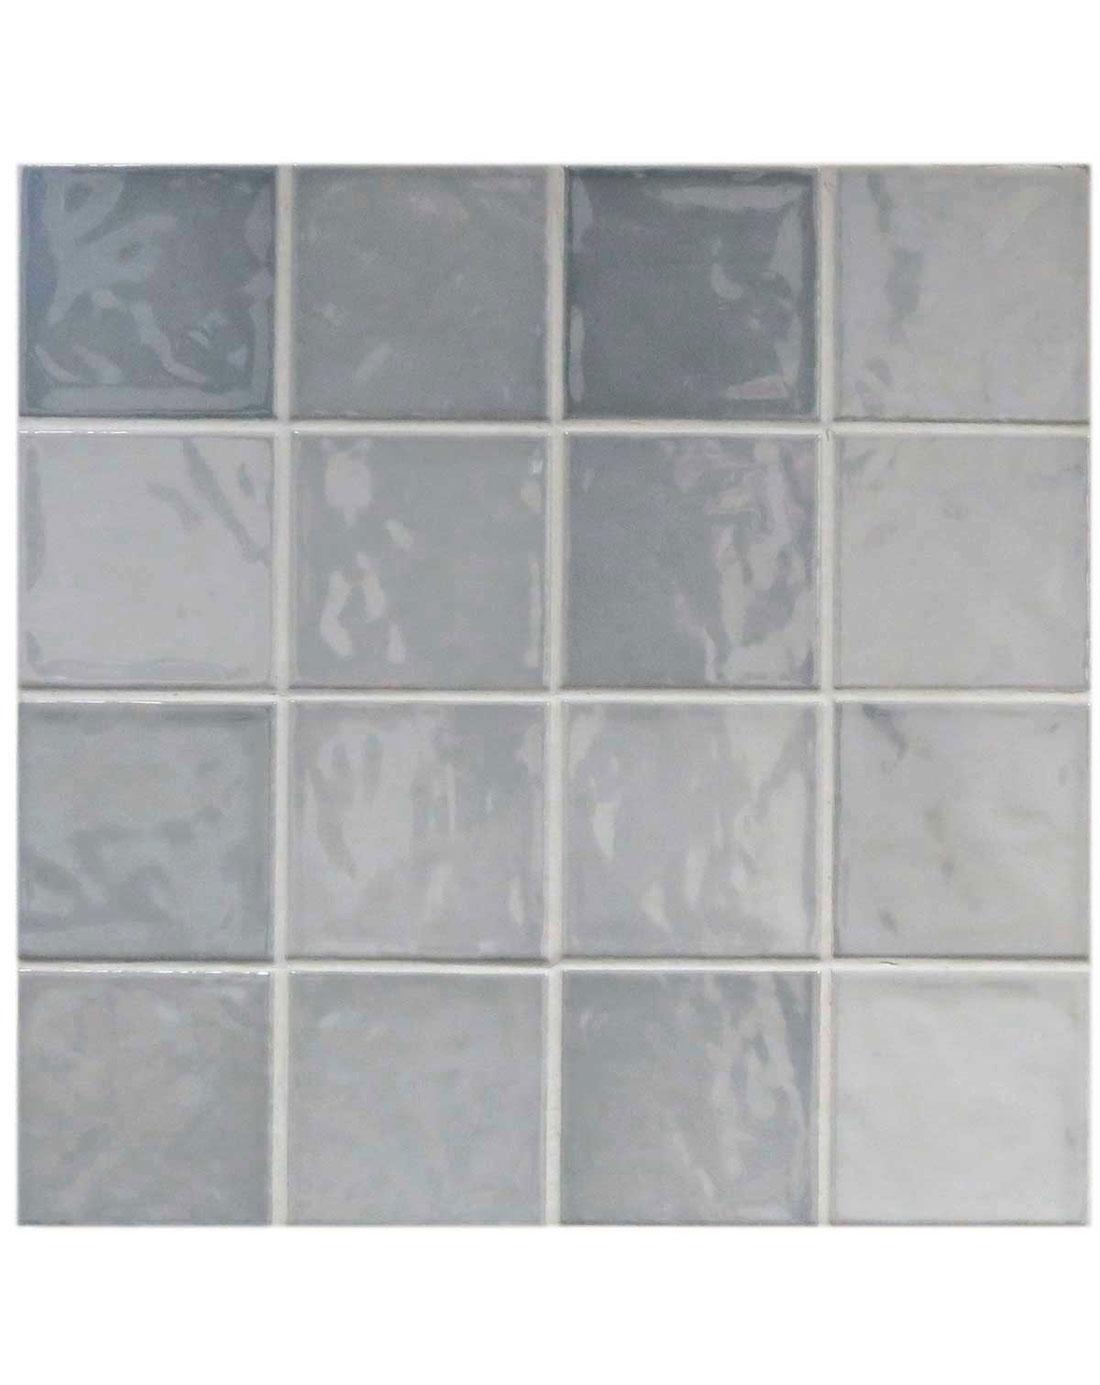 Perla capri tiles only 31m2 free tile samples perla capri tile kitchentilesdirect dailygadgetfo Image collections